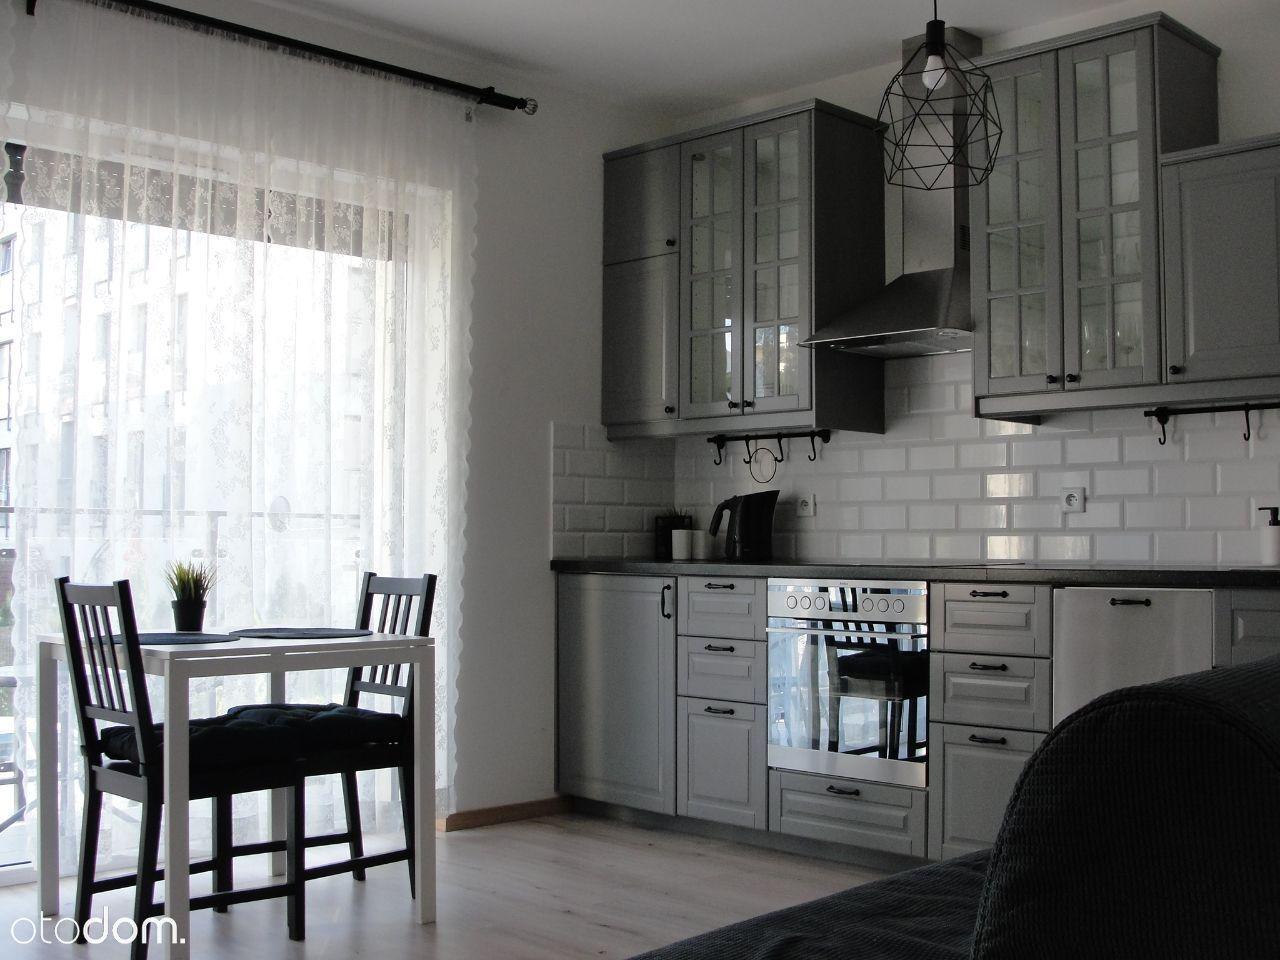 Kawalerka 31 m2 Teofila MAteckiego